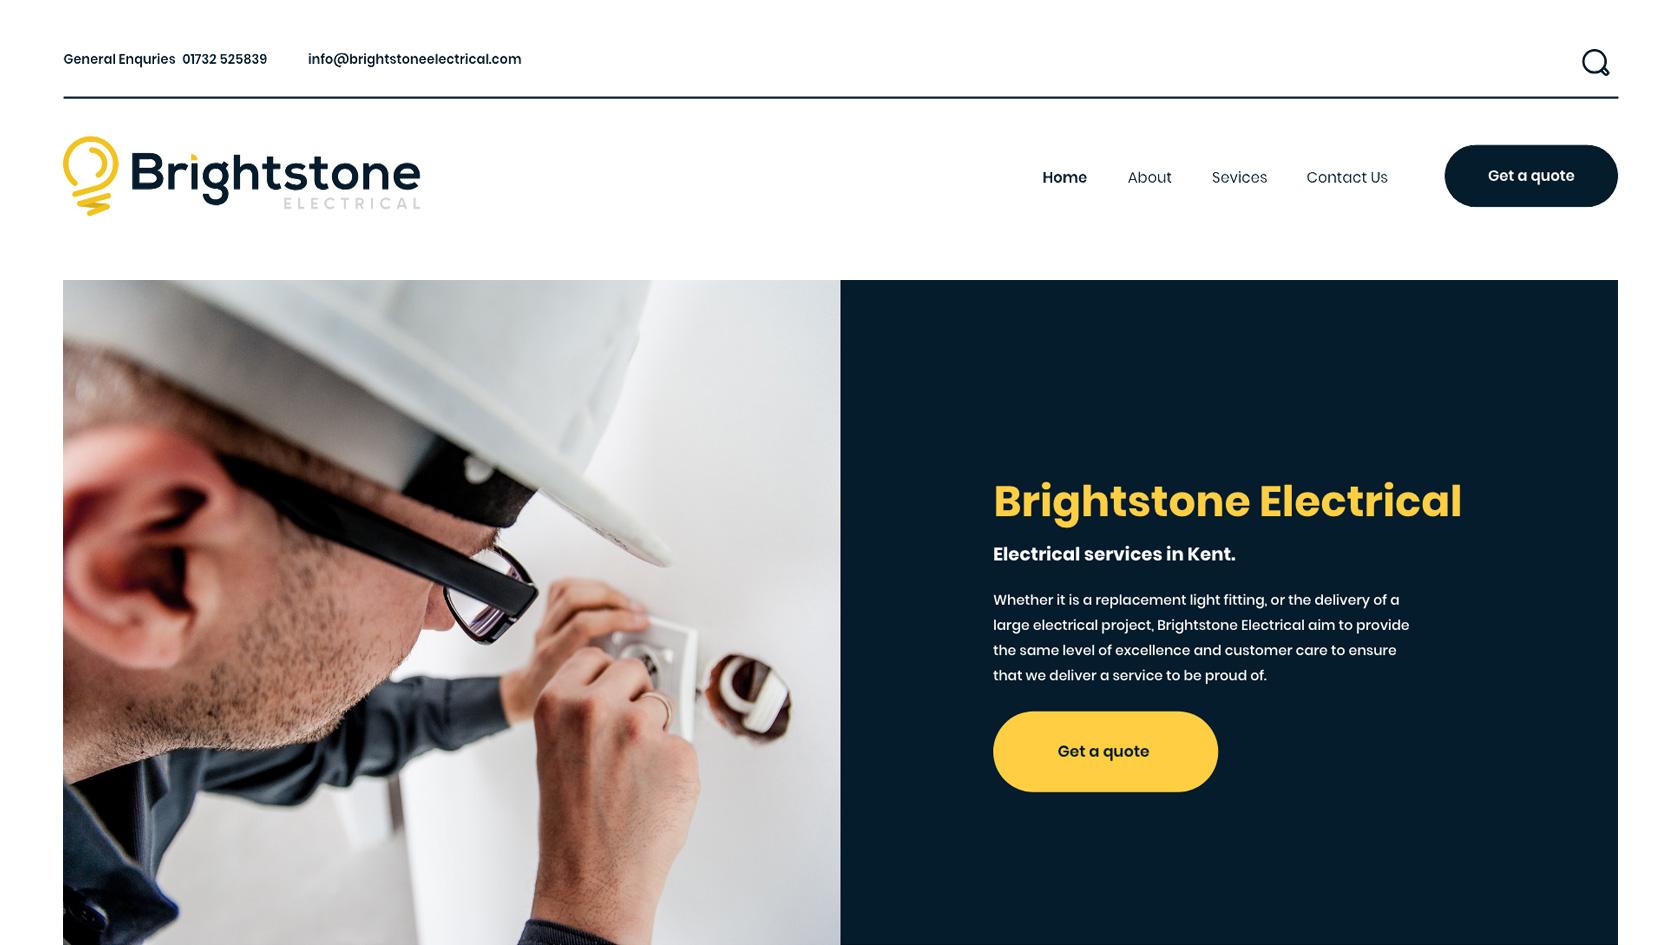 Brightstone-Website-Design-3